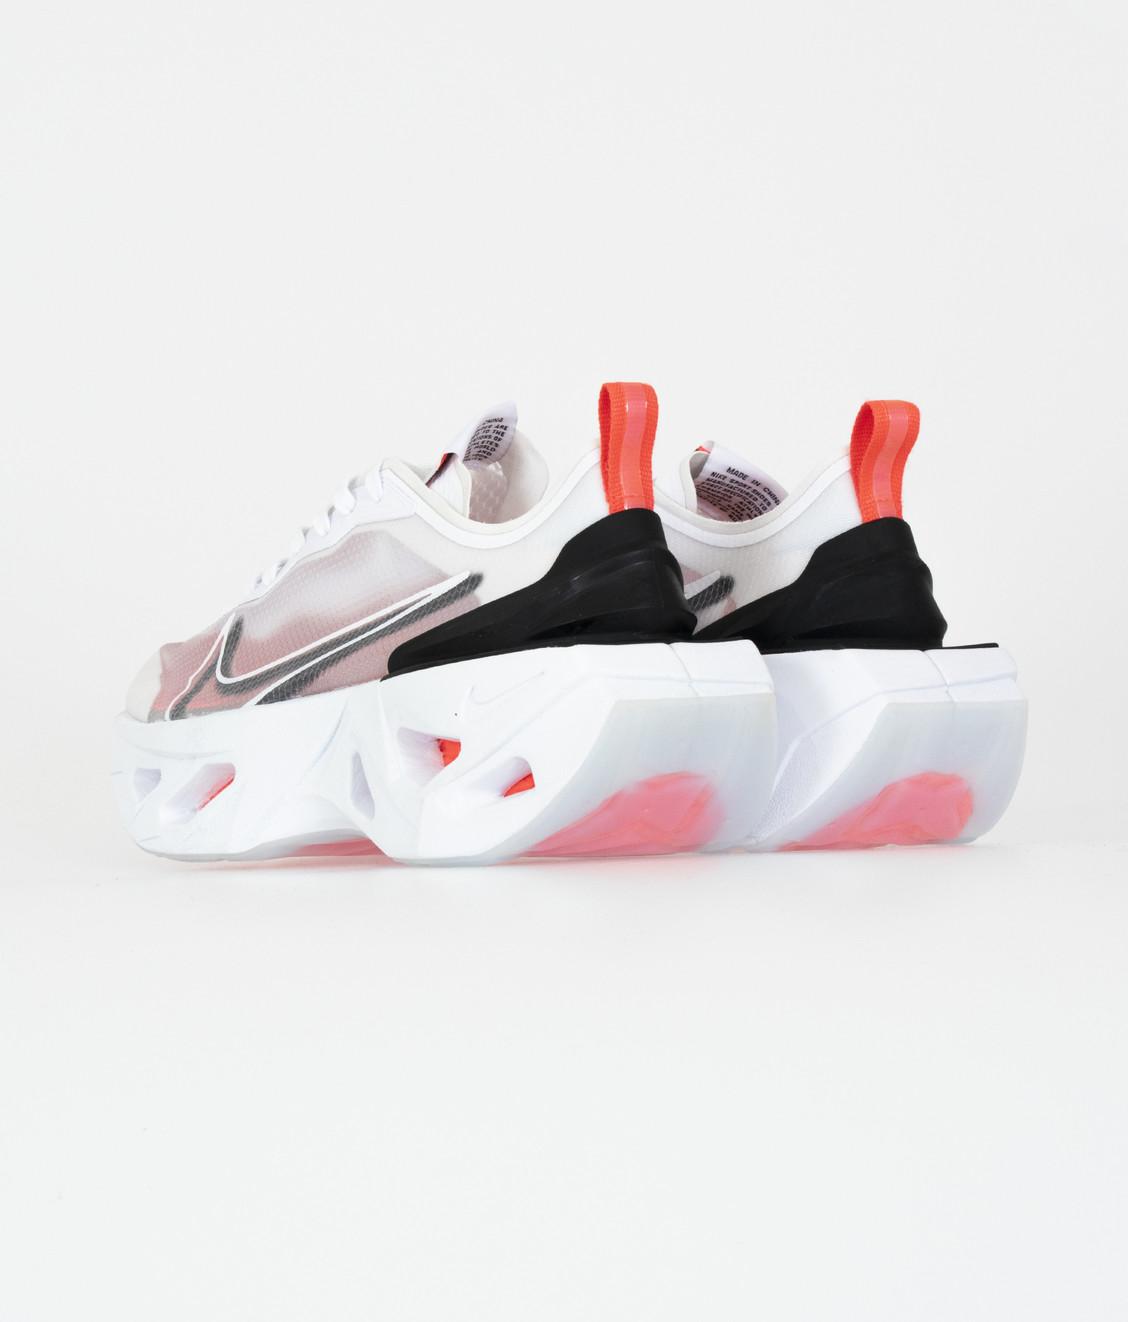 Nike Zoom X Vista Grind White Black